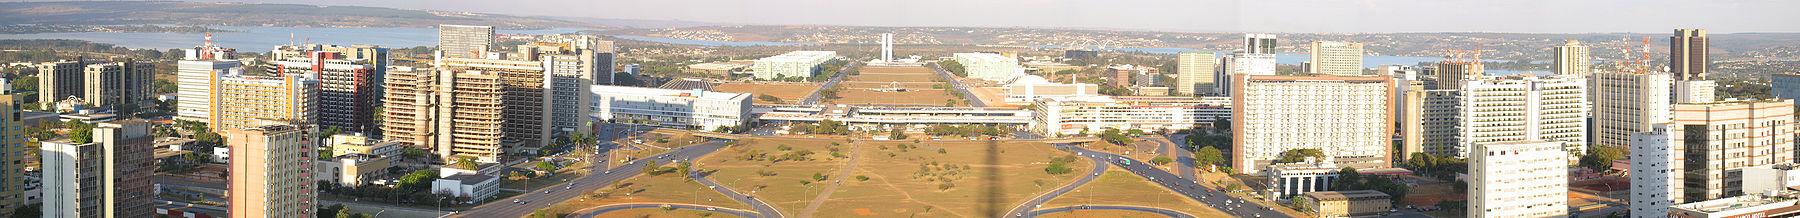 Panorama do Eixo Monumental no Plano Piloto.